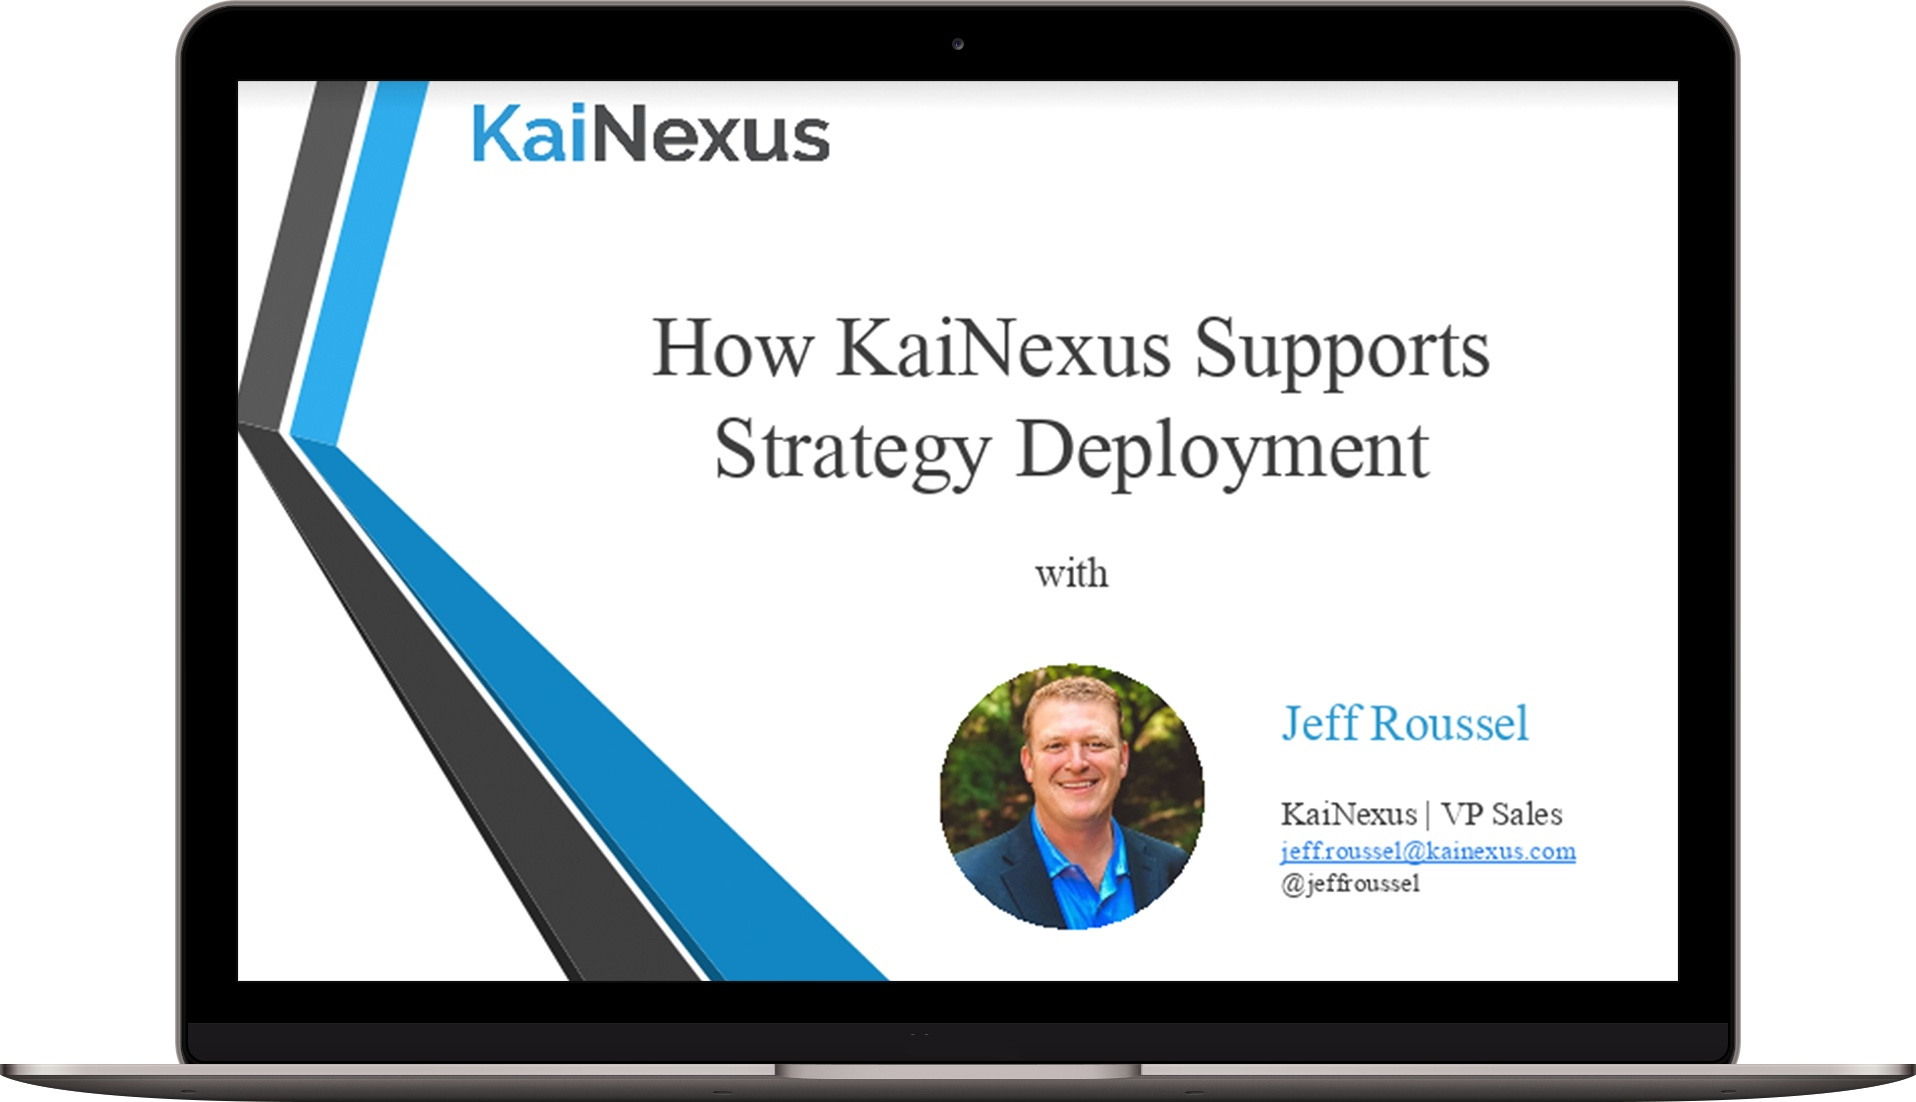 KaiNexus Strategy Deployment